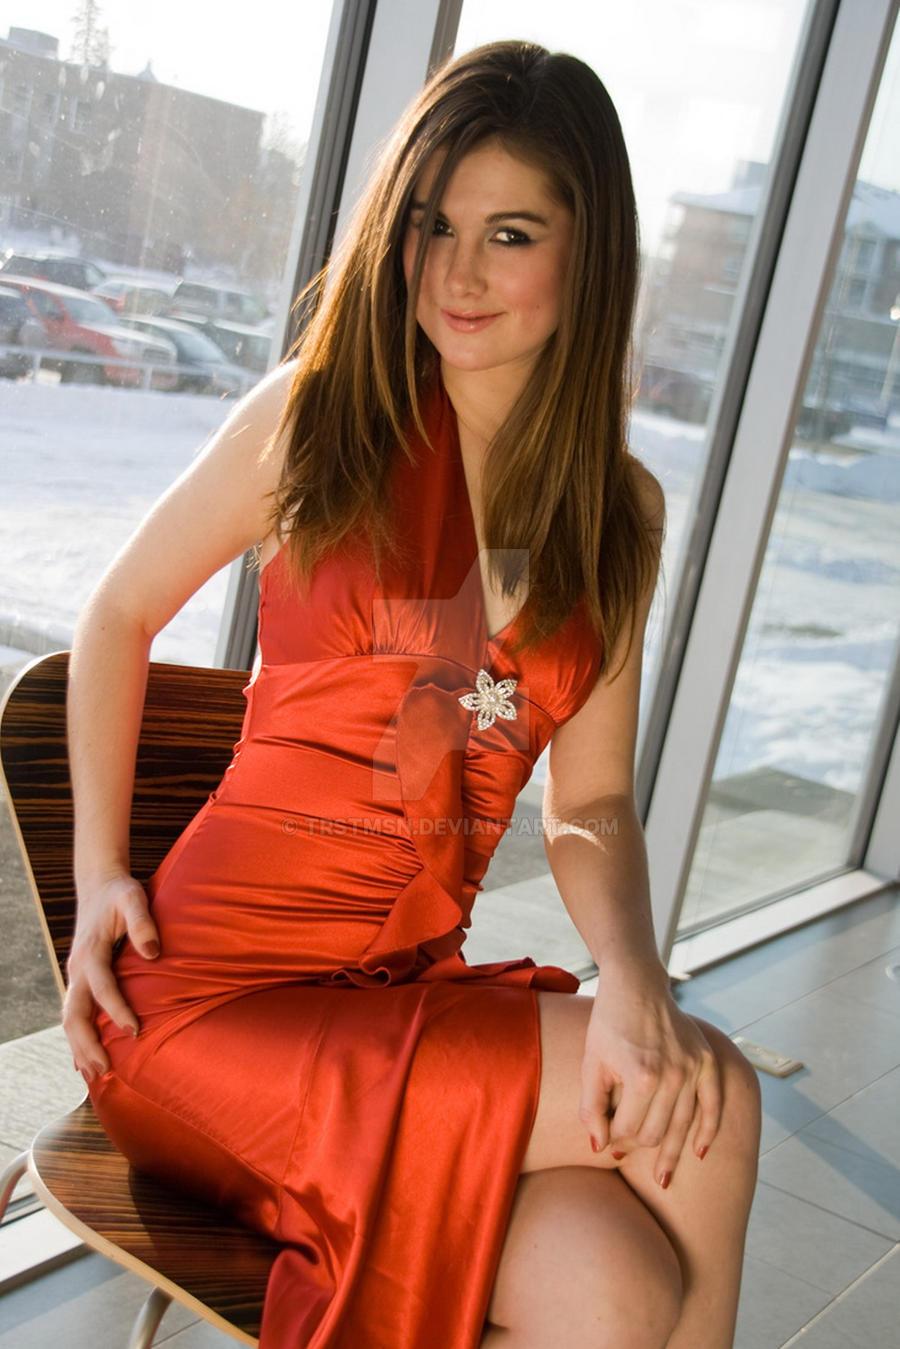 Amanda red dress by trstmsn